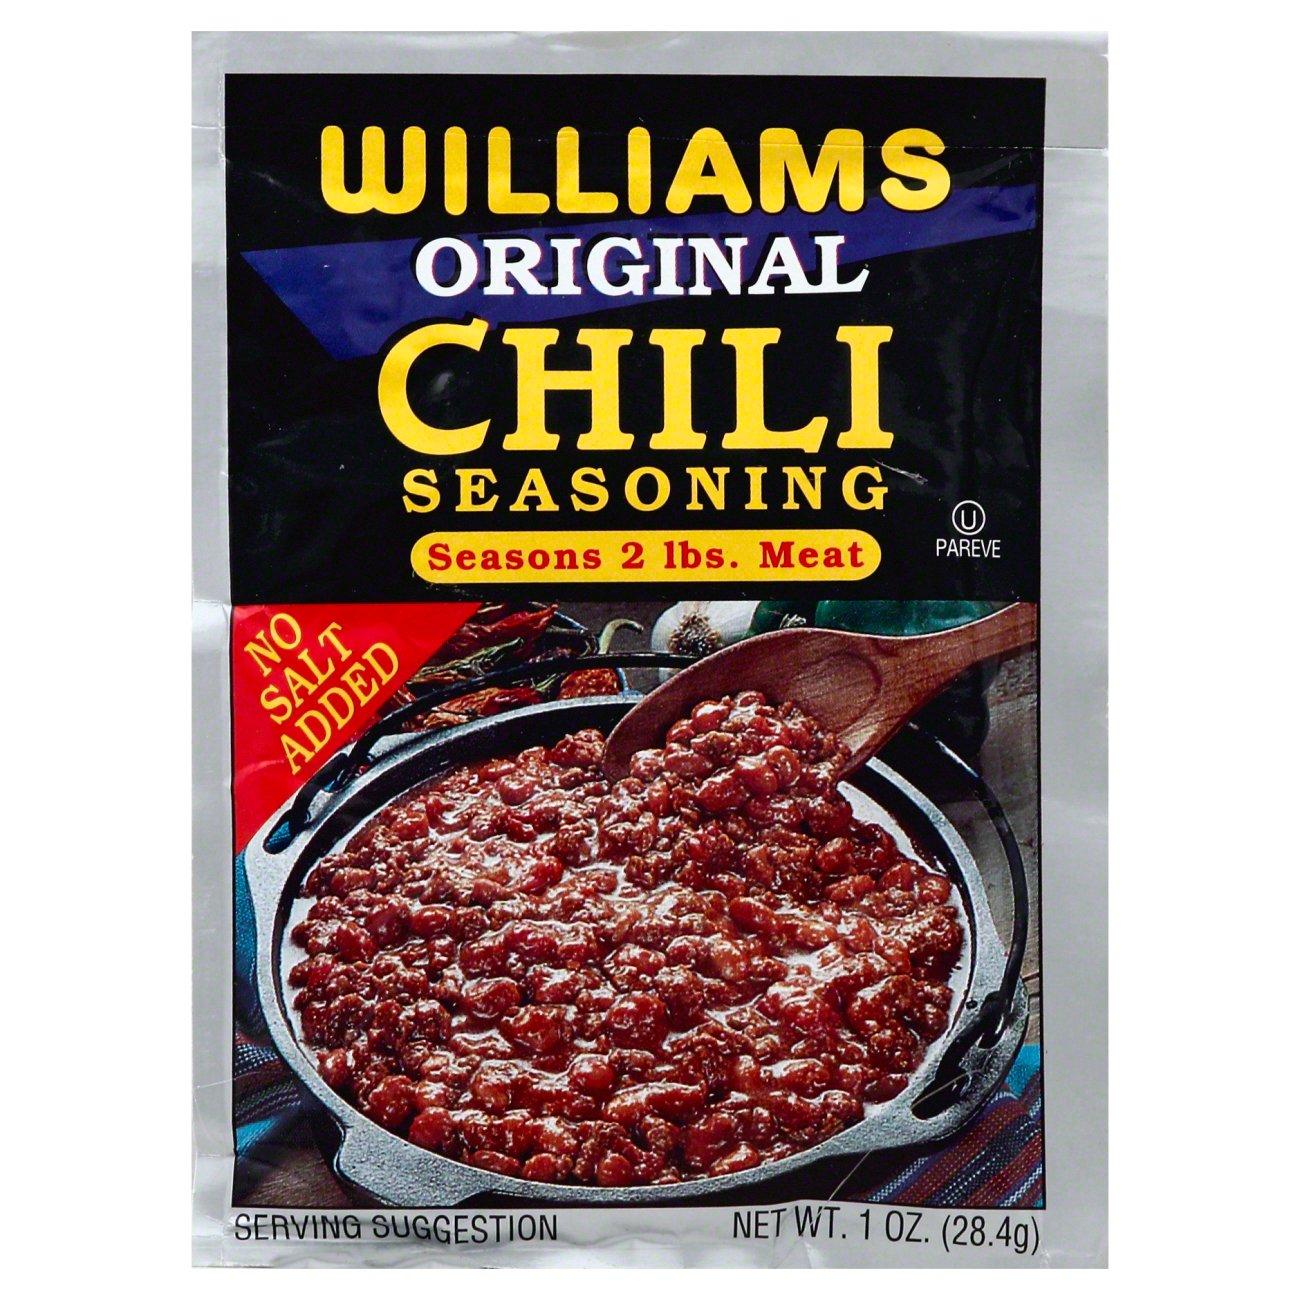 Williams Original Chili Seasoning